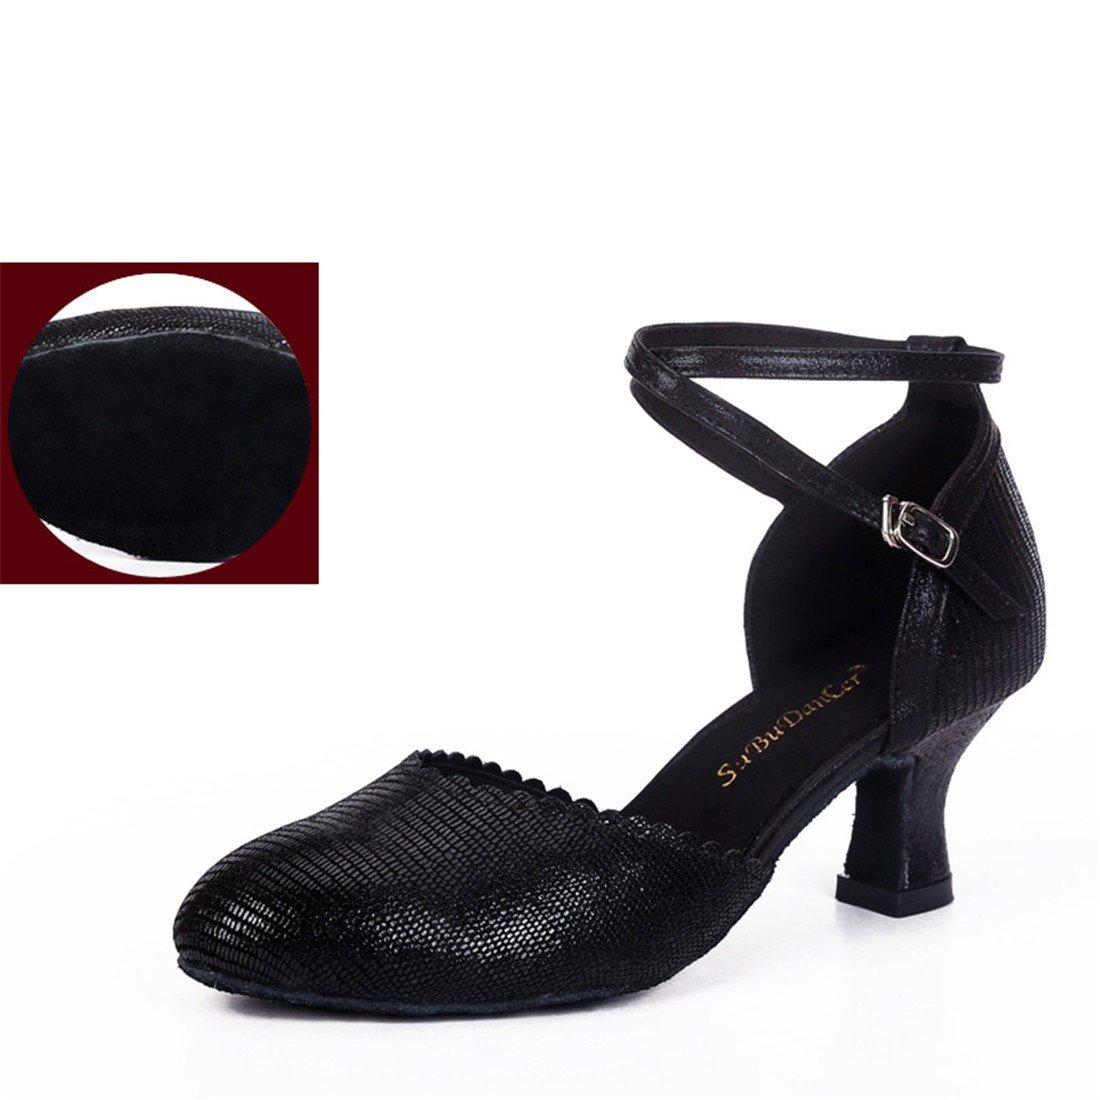 QDKM Slippers Women High Heel Rose Muffin Cake Non-Slip Womens Pinch Beach flip Flop Female Sandals,See Chart,4.5